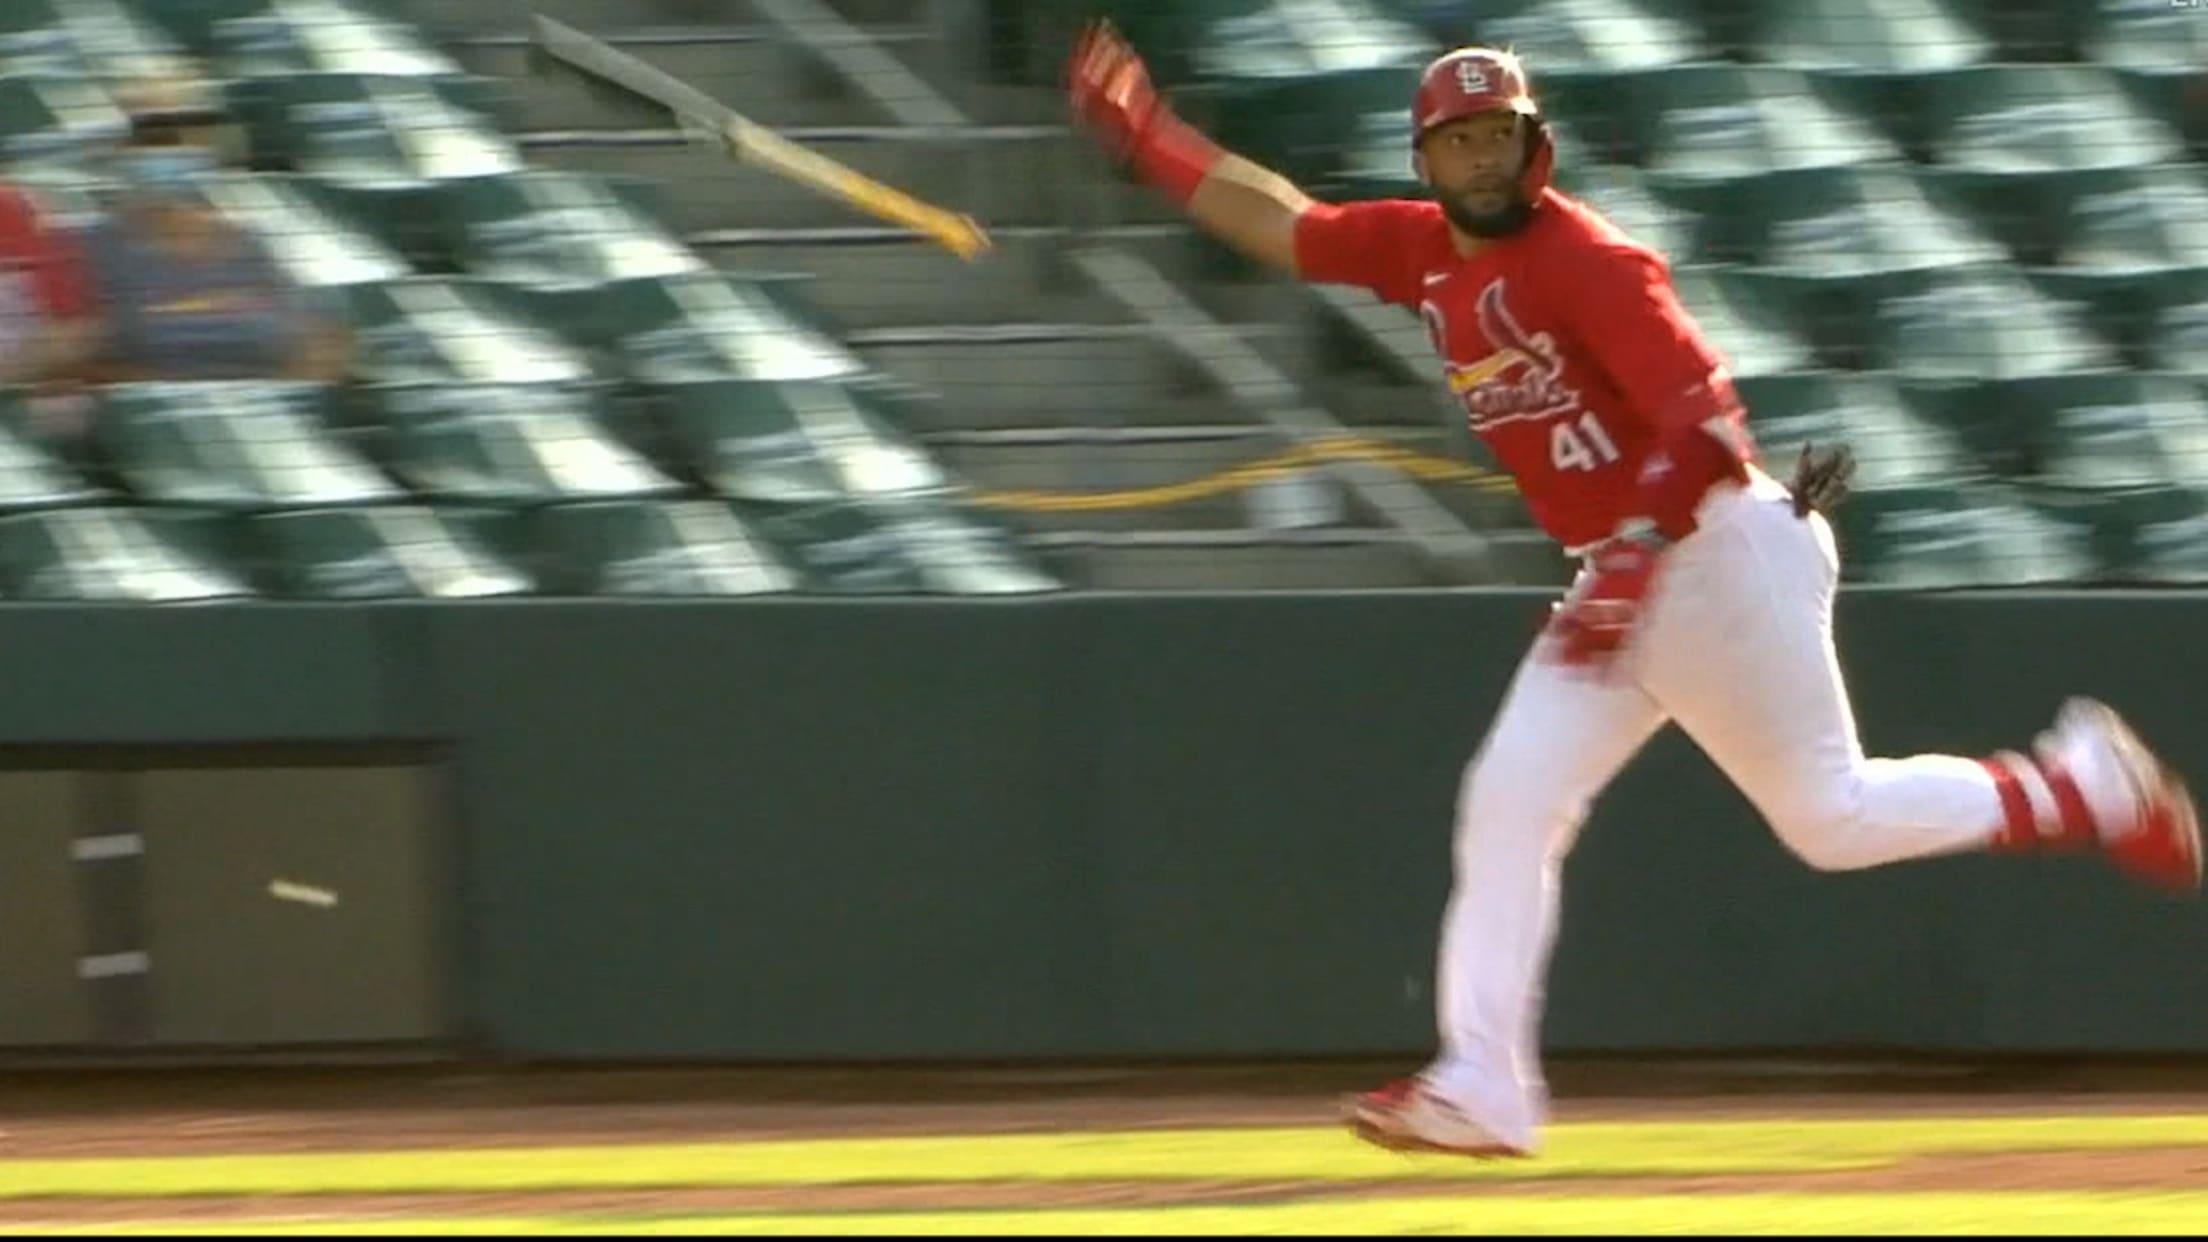 Ali Sánchez's two-run homer